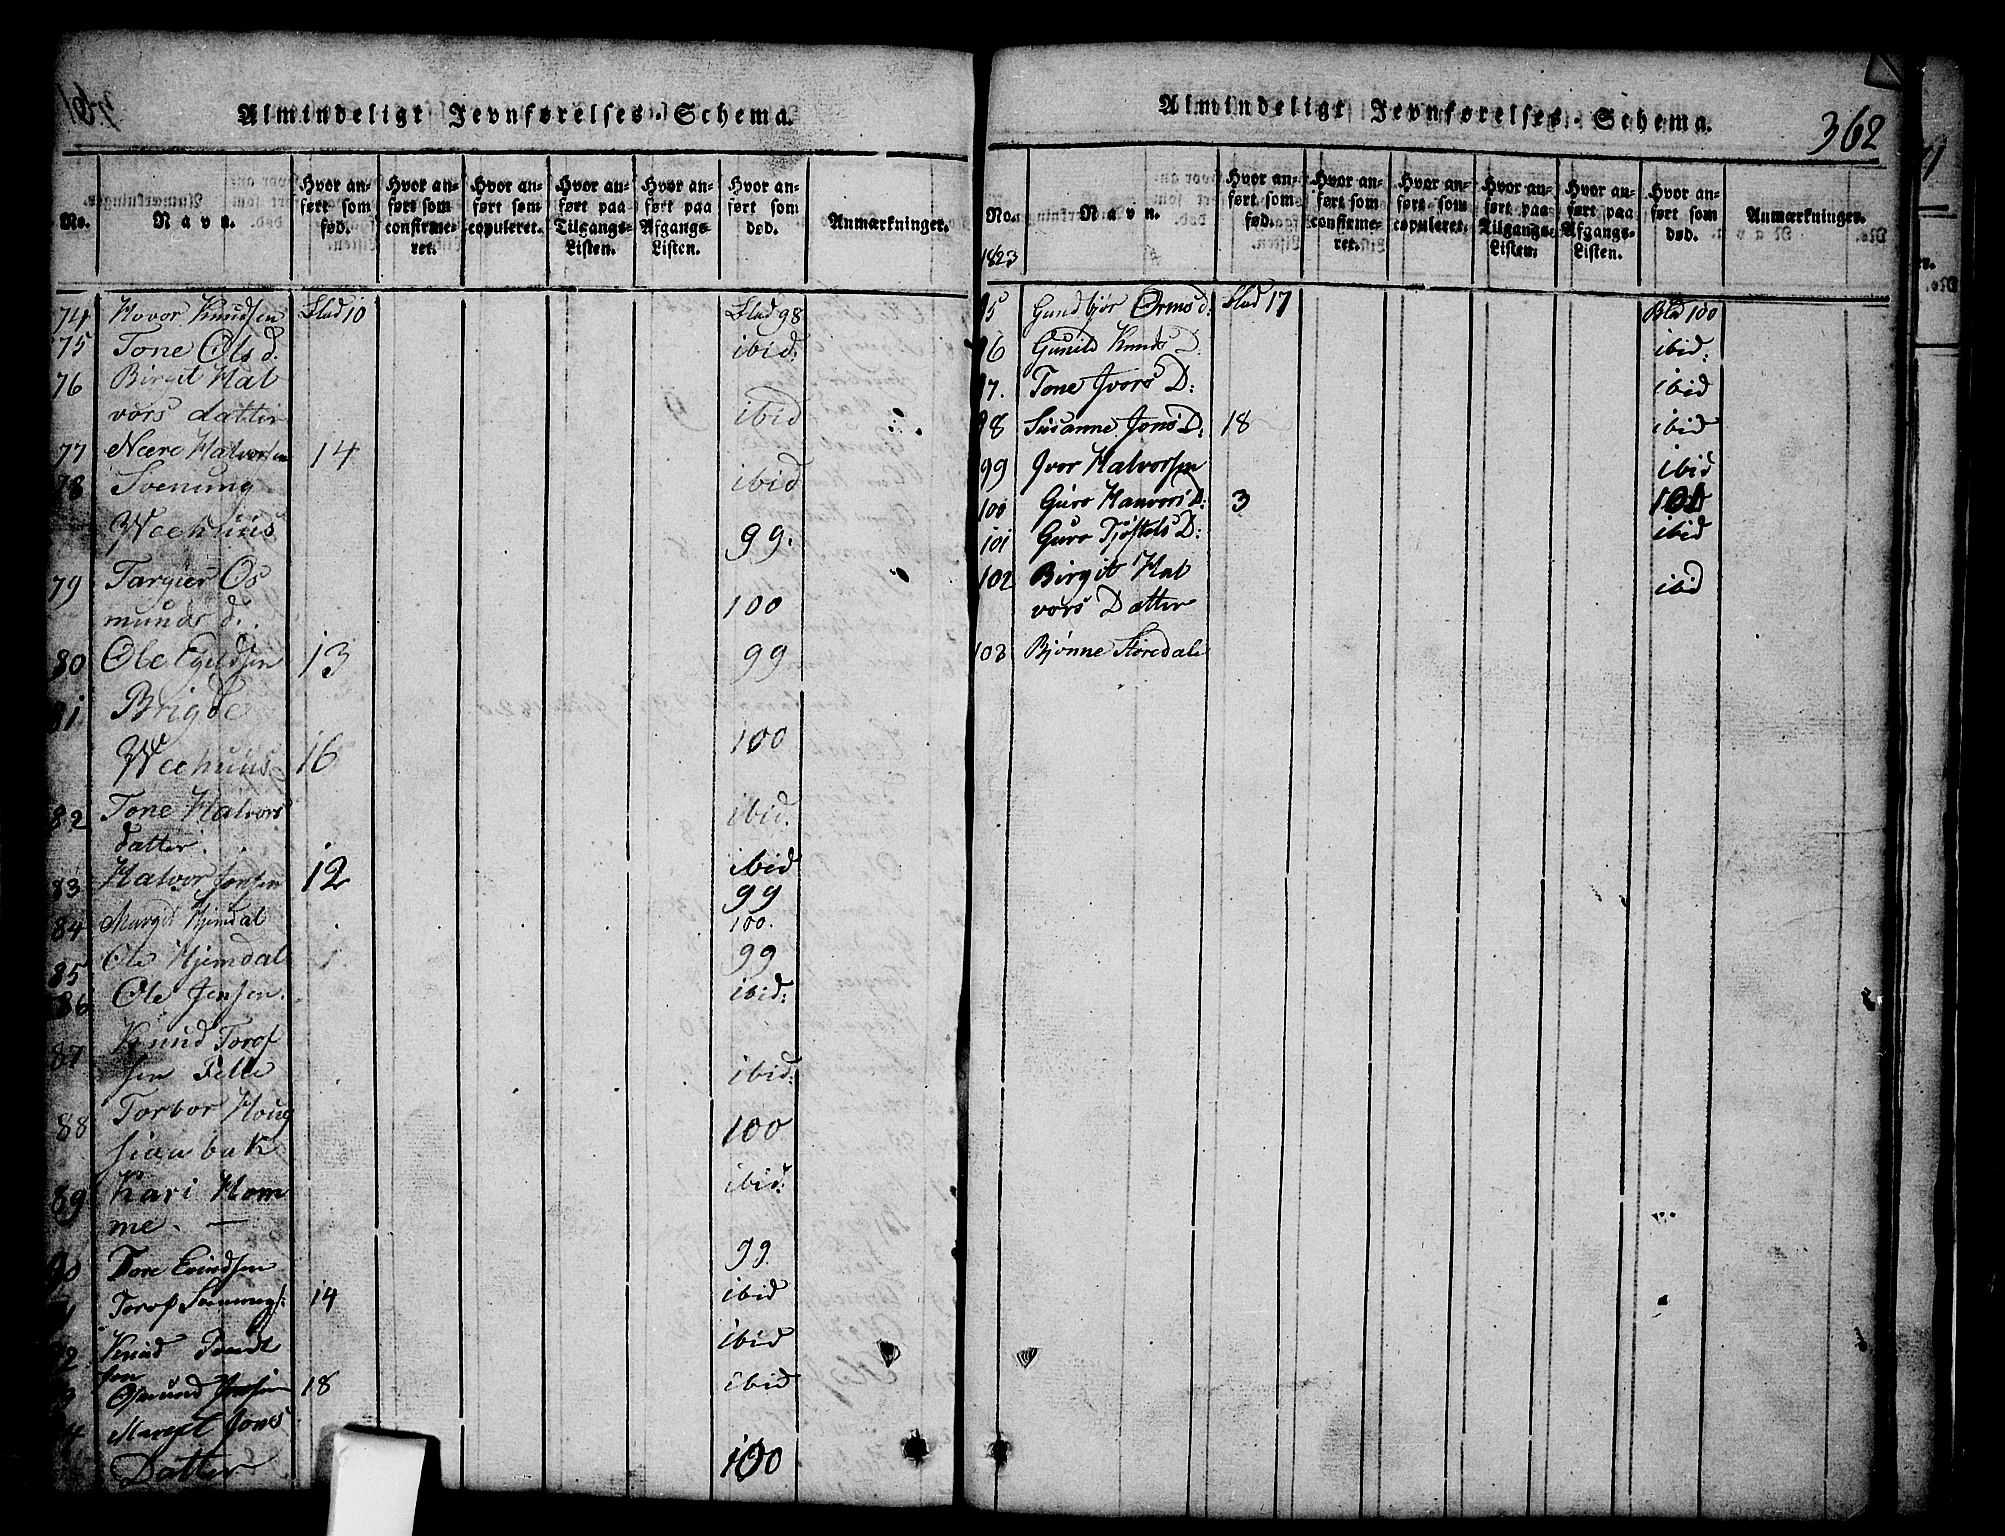 SAKO, Nissedal kirkebøker, G/Gb/L0001: Klokkerbok nr. II 1, 1814-1862, s. 362